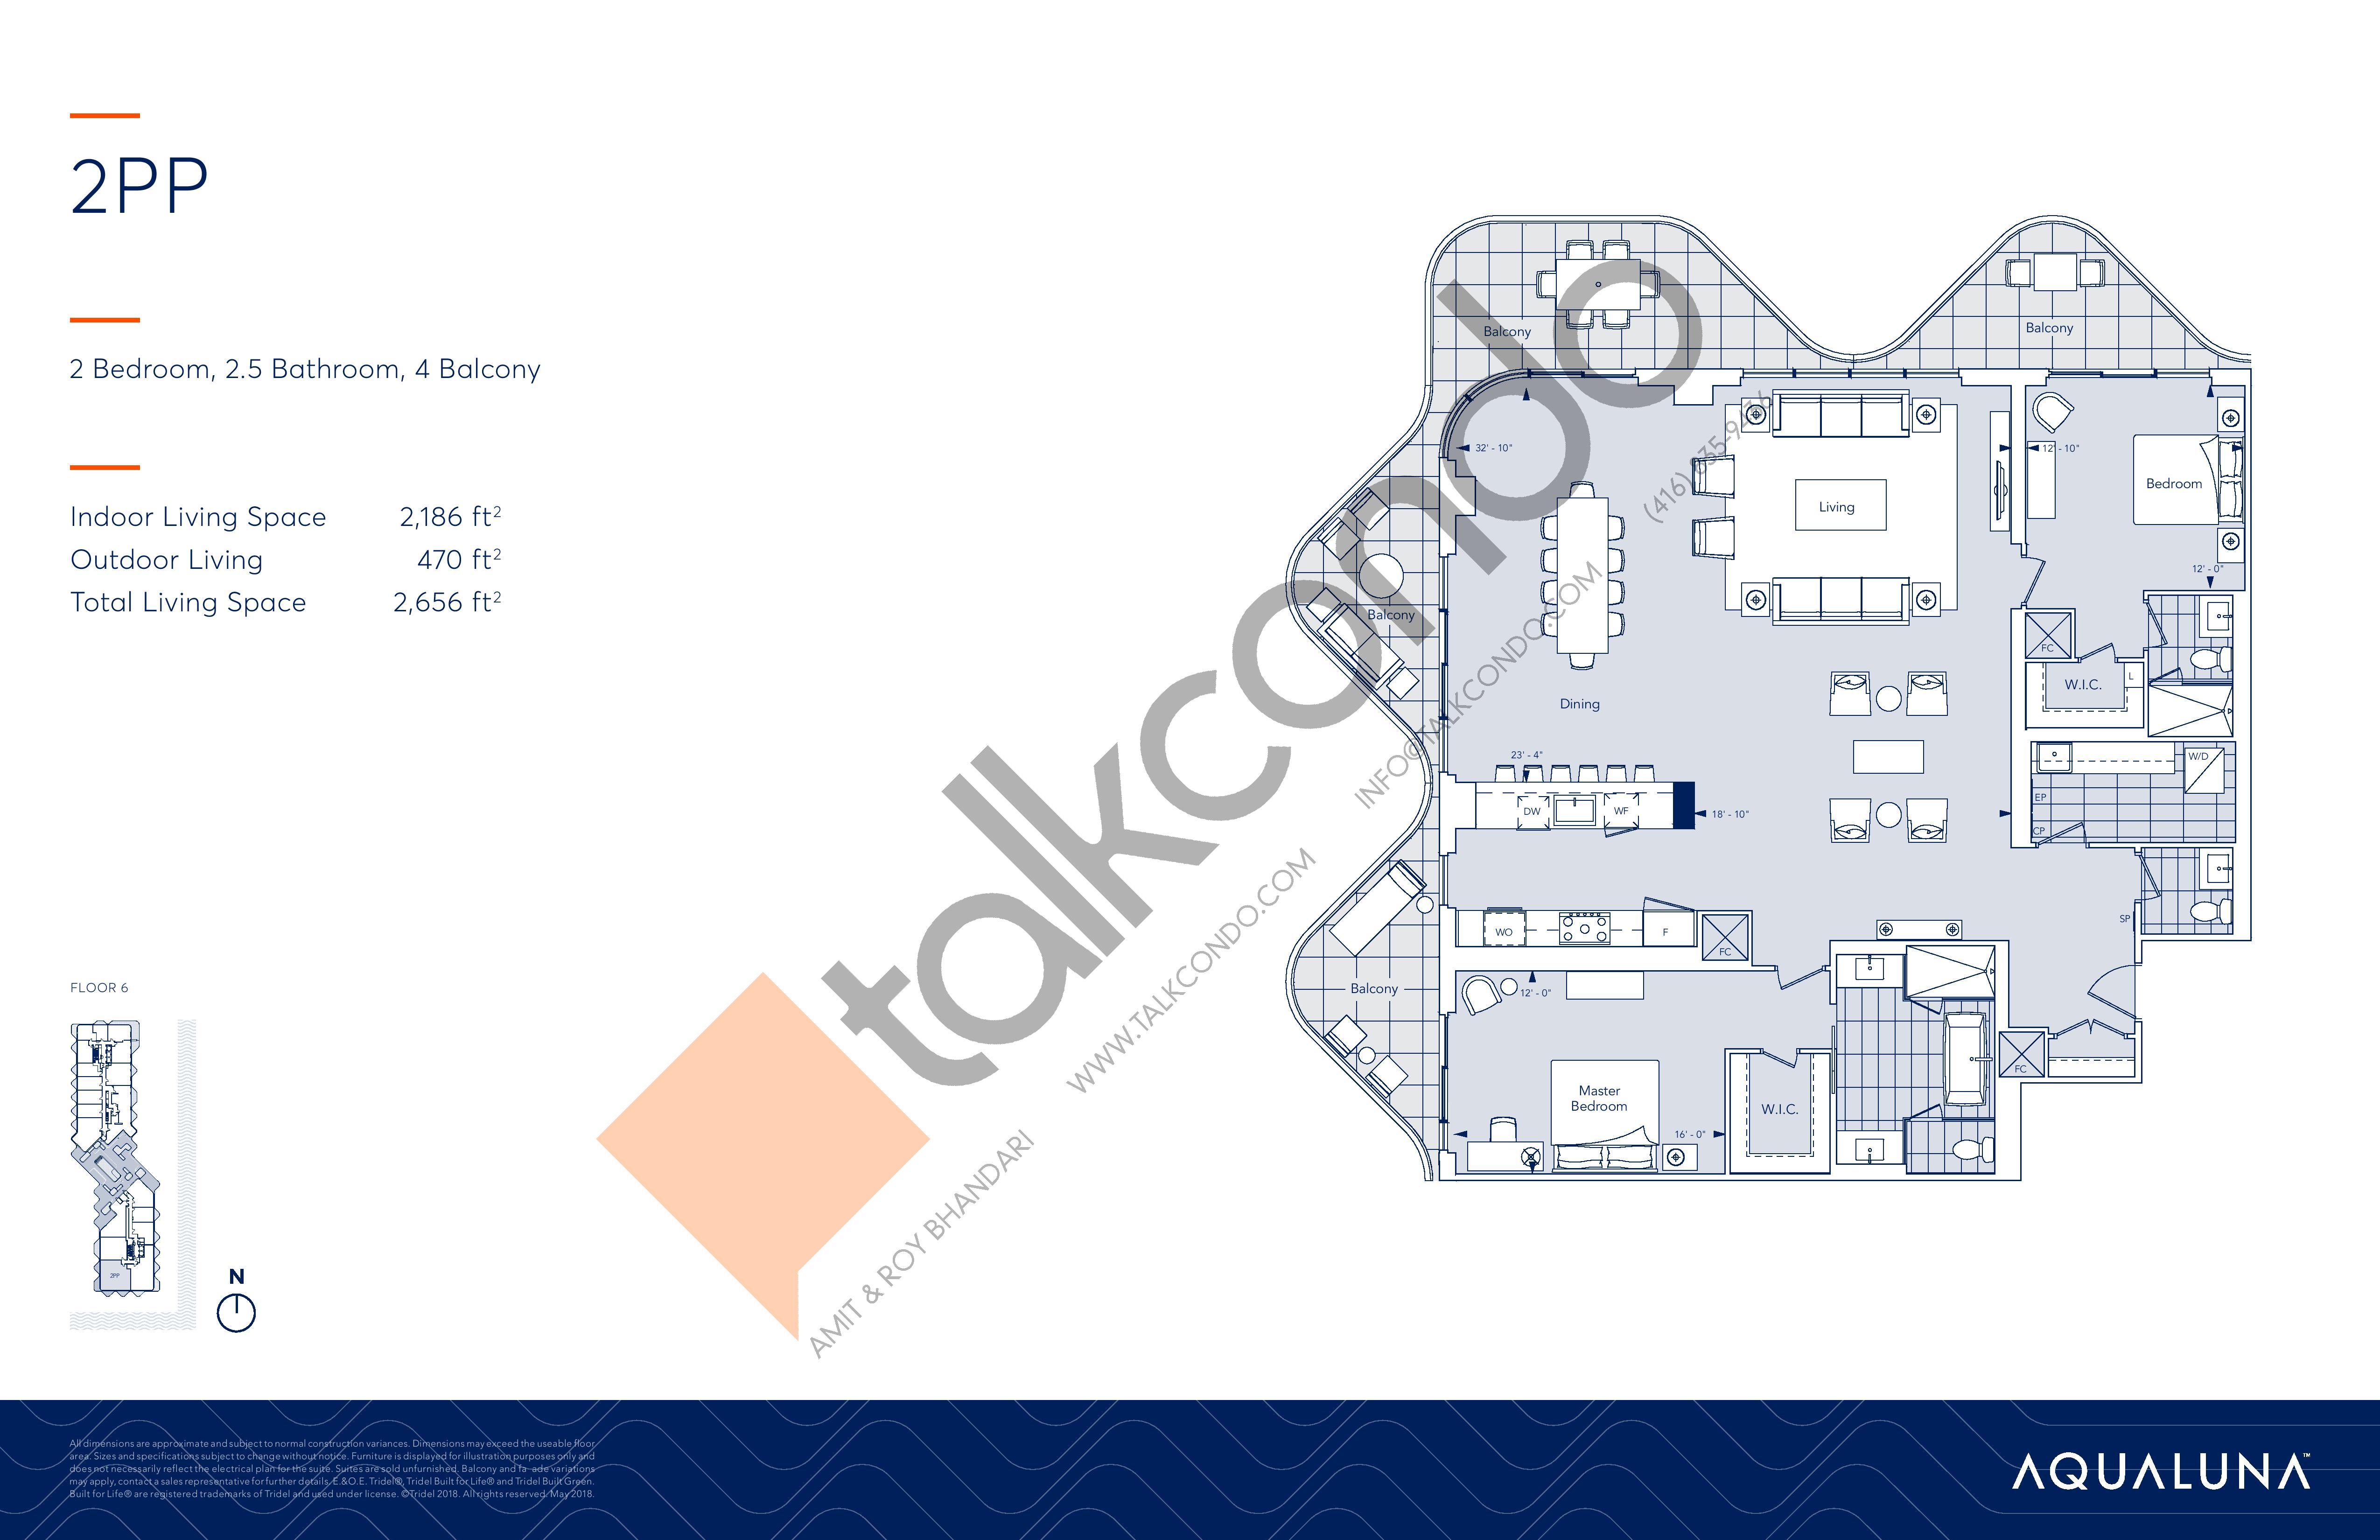 2PP Floor Plan at Aqualuna at Bayside Condos - 2186 sq.ft